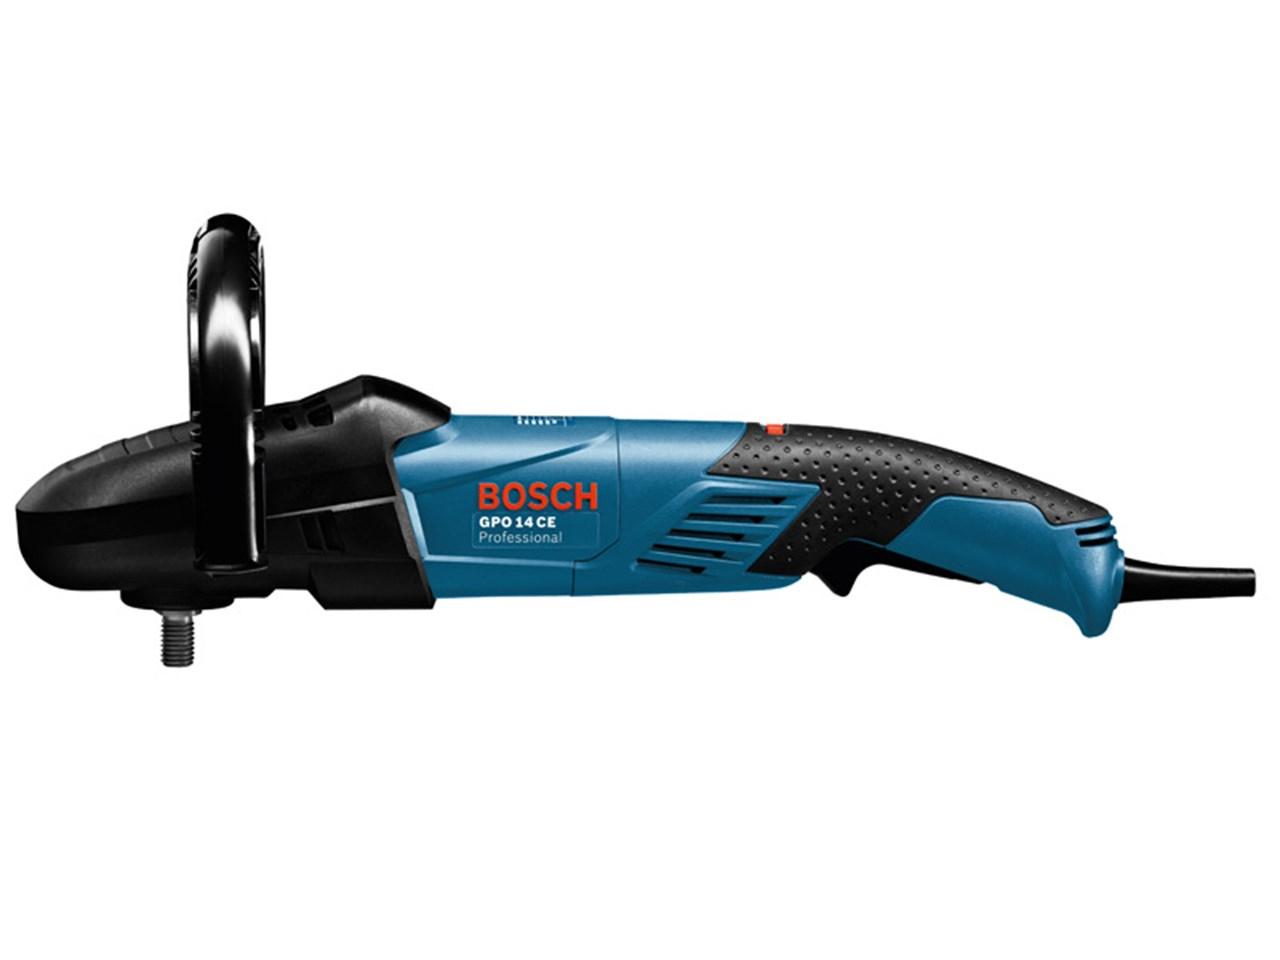 Bosch_GPO14CE.jpg